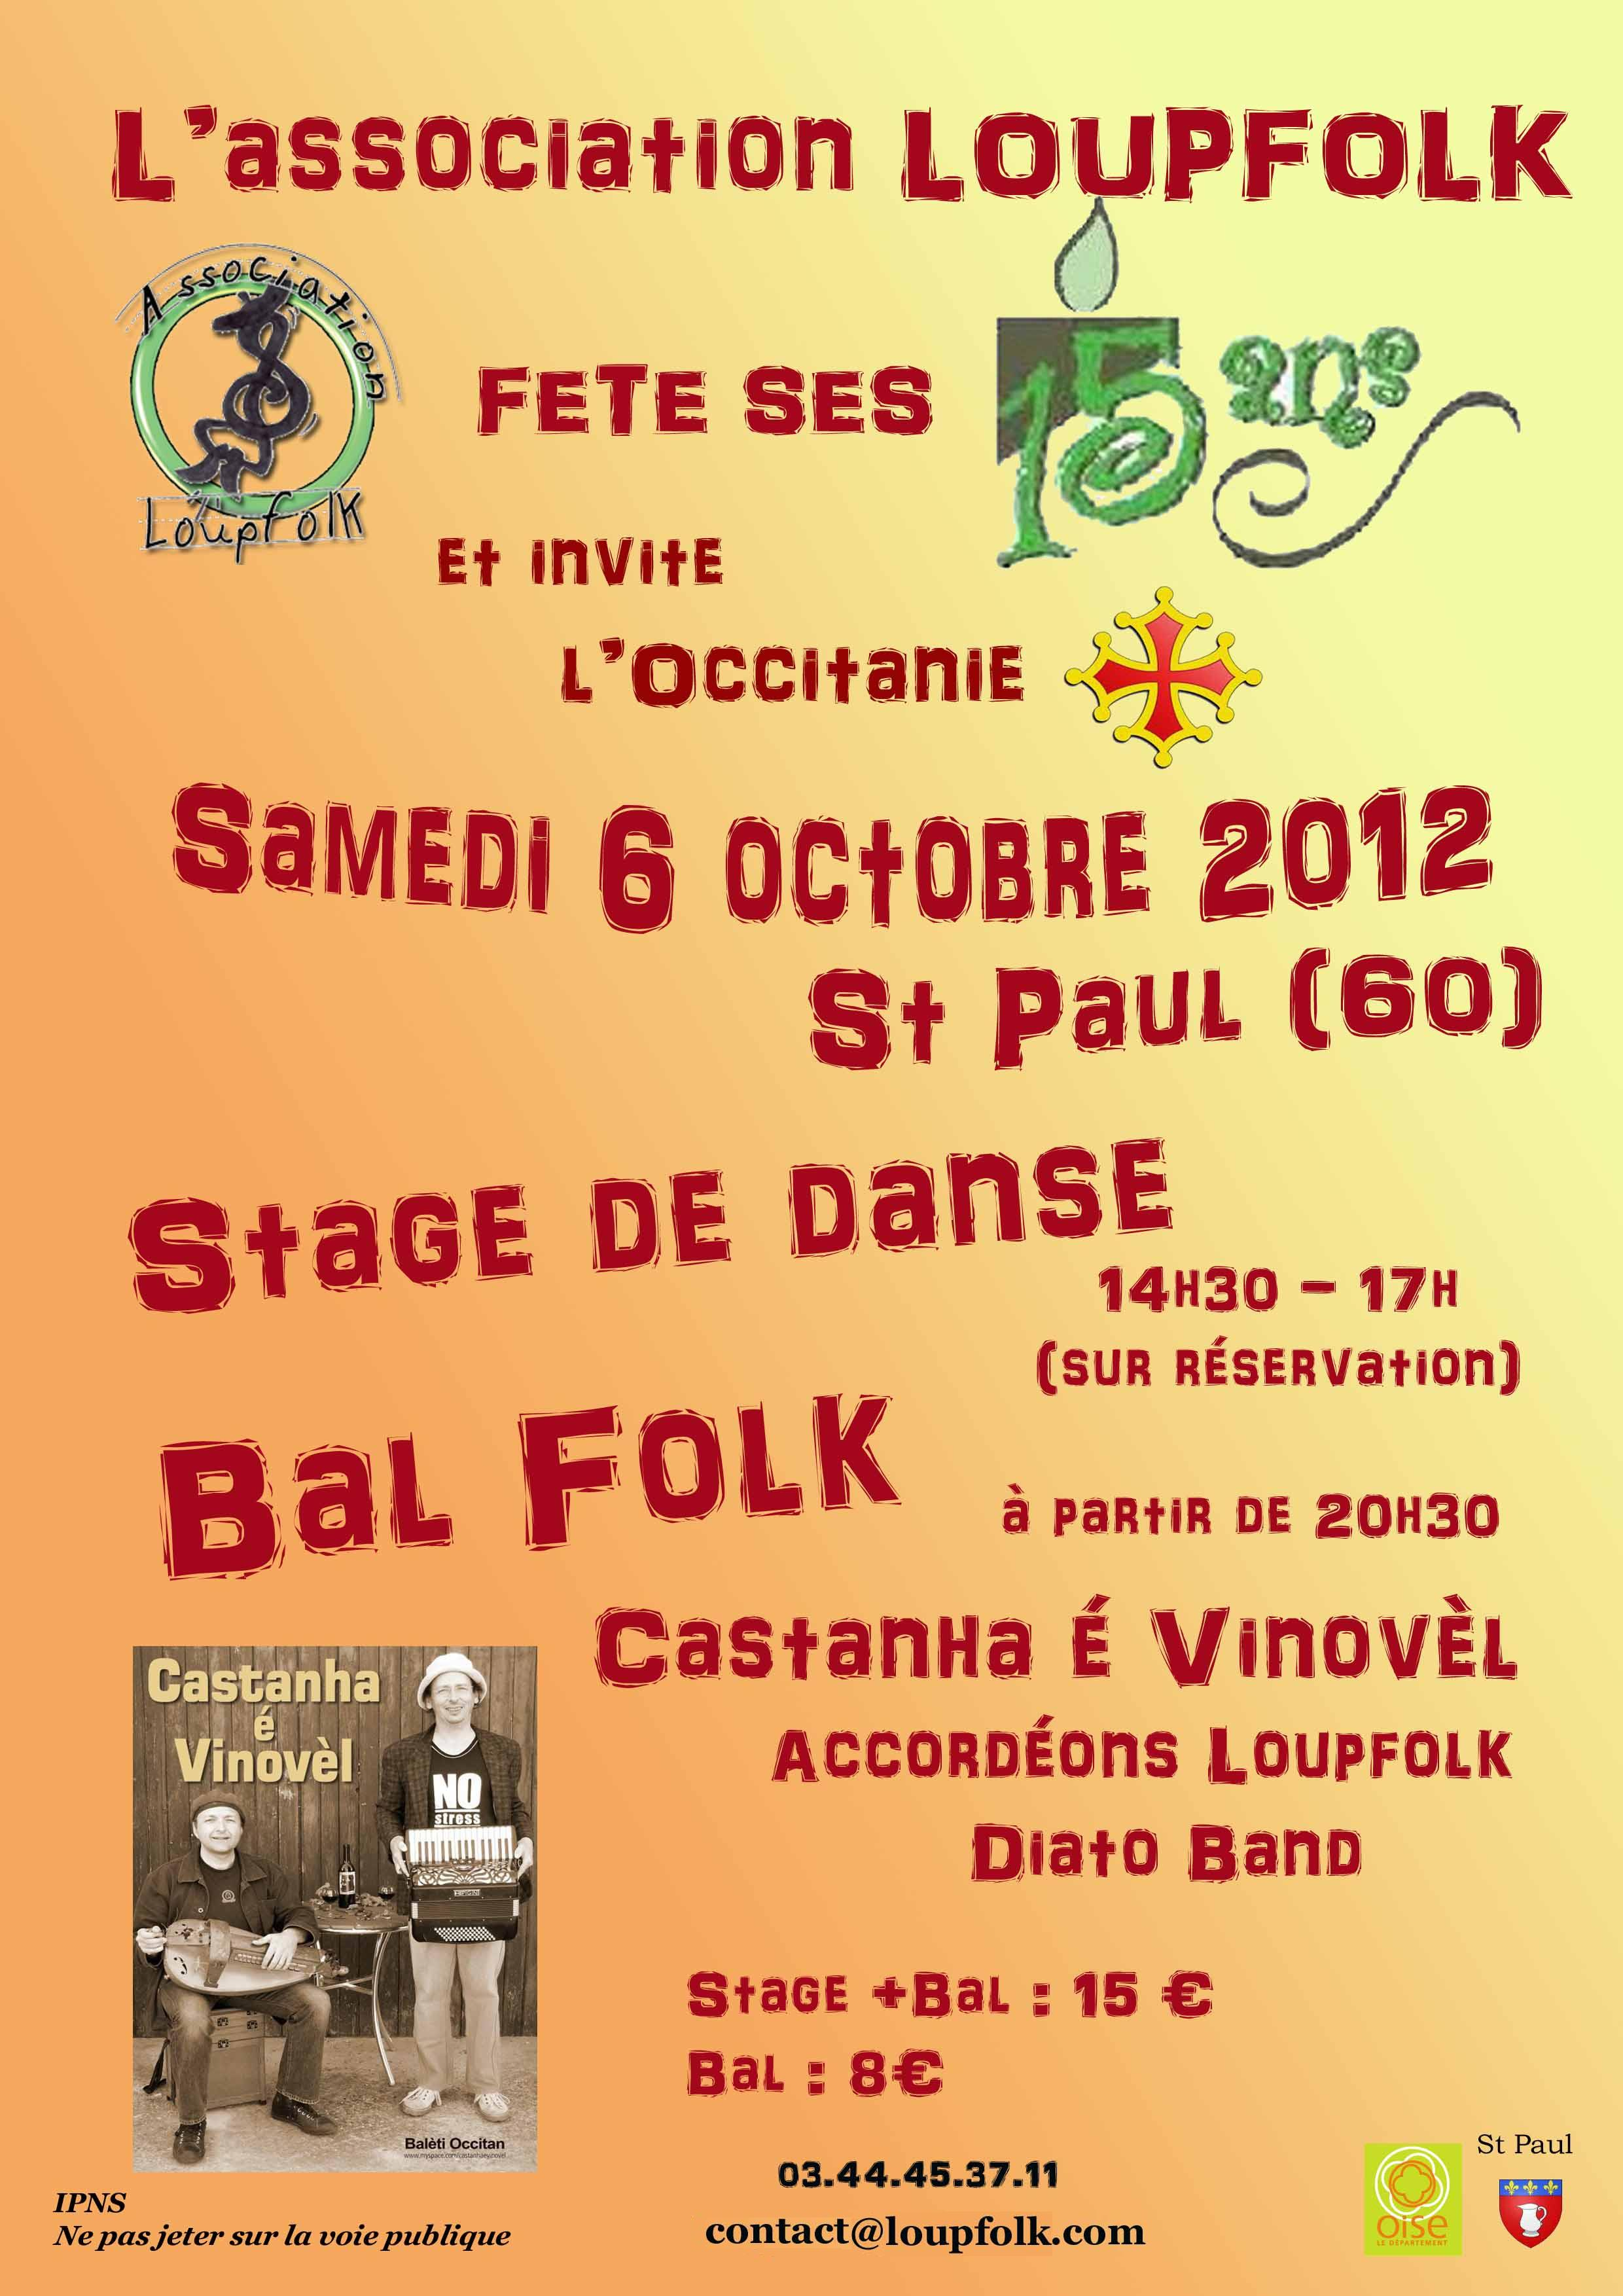 Bal folk des 15 ans de Loupfolk samedi 6 octobre à Saint-Paul (60650)